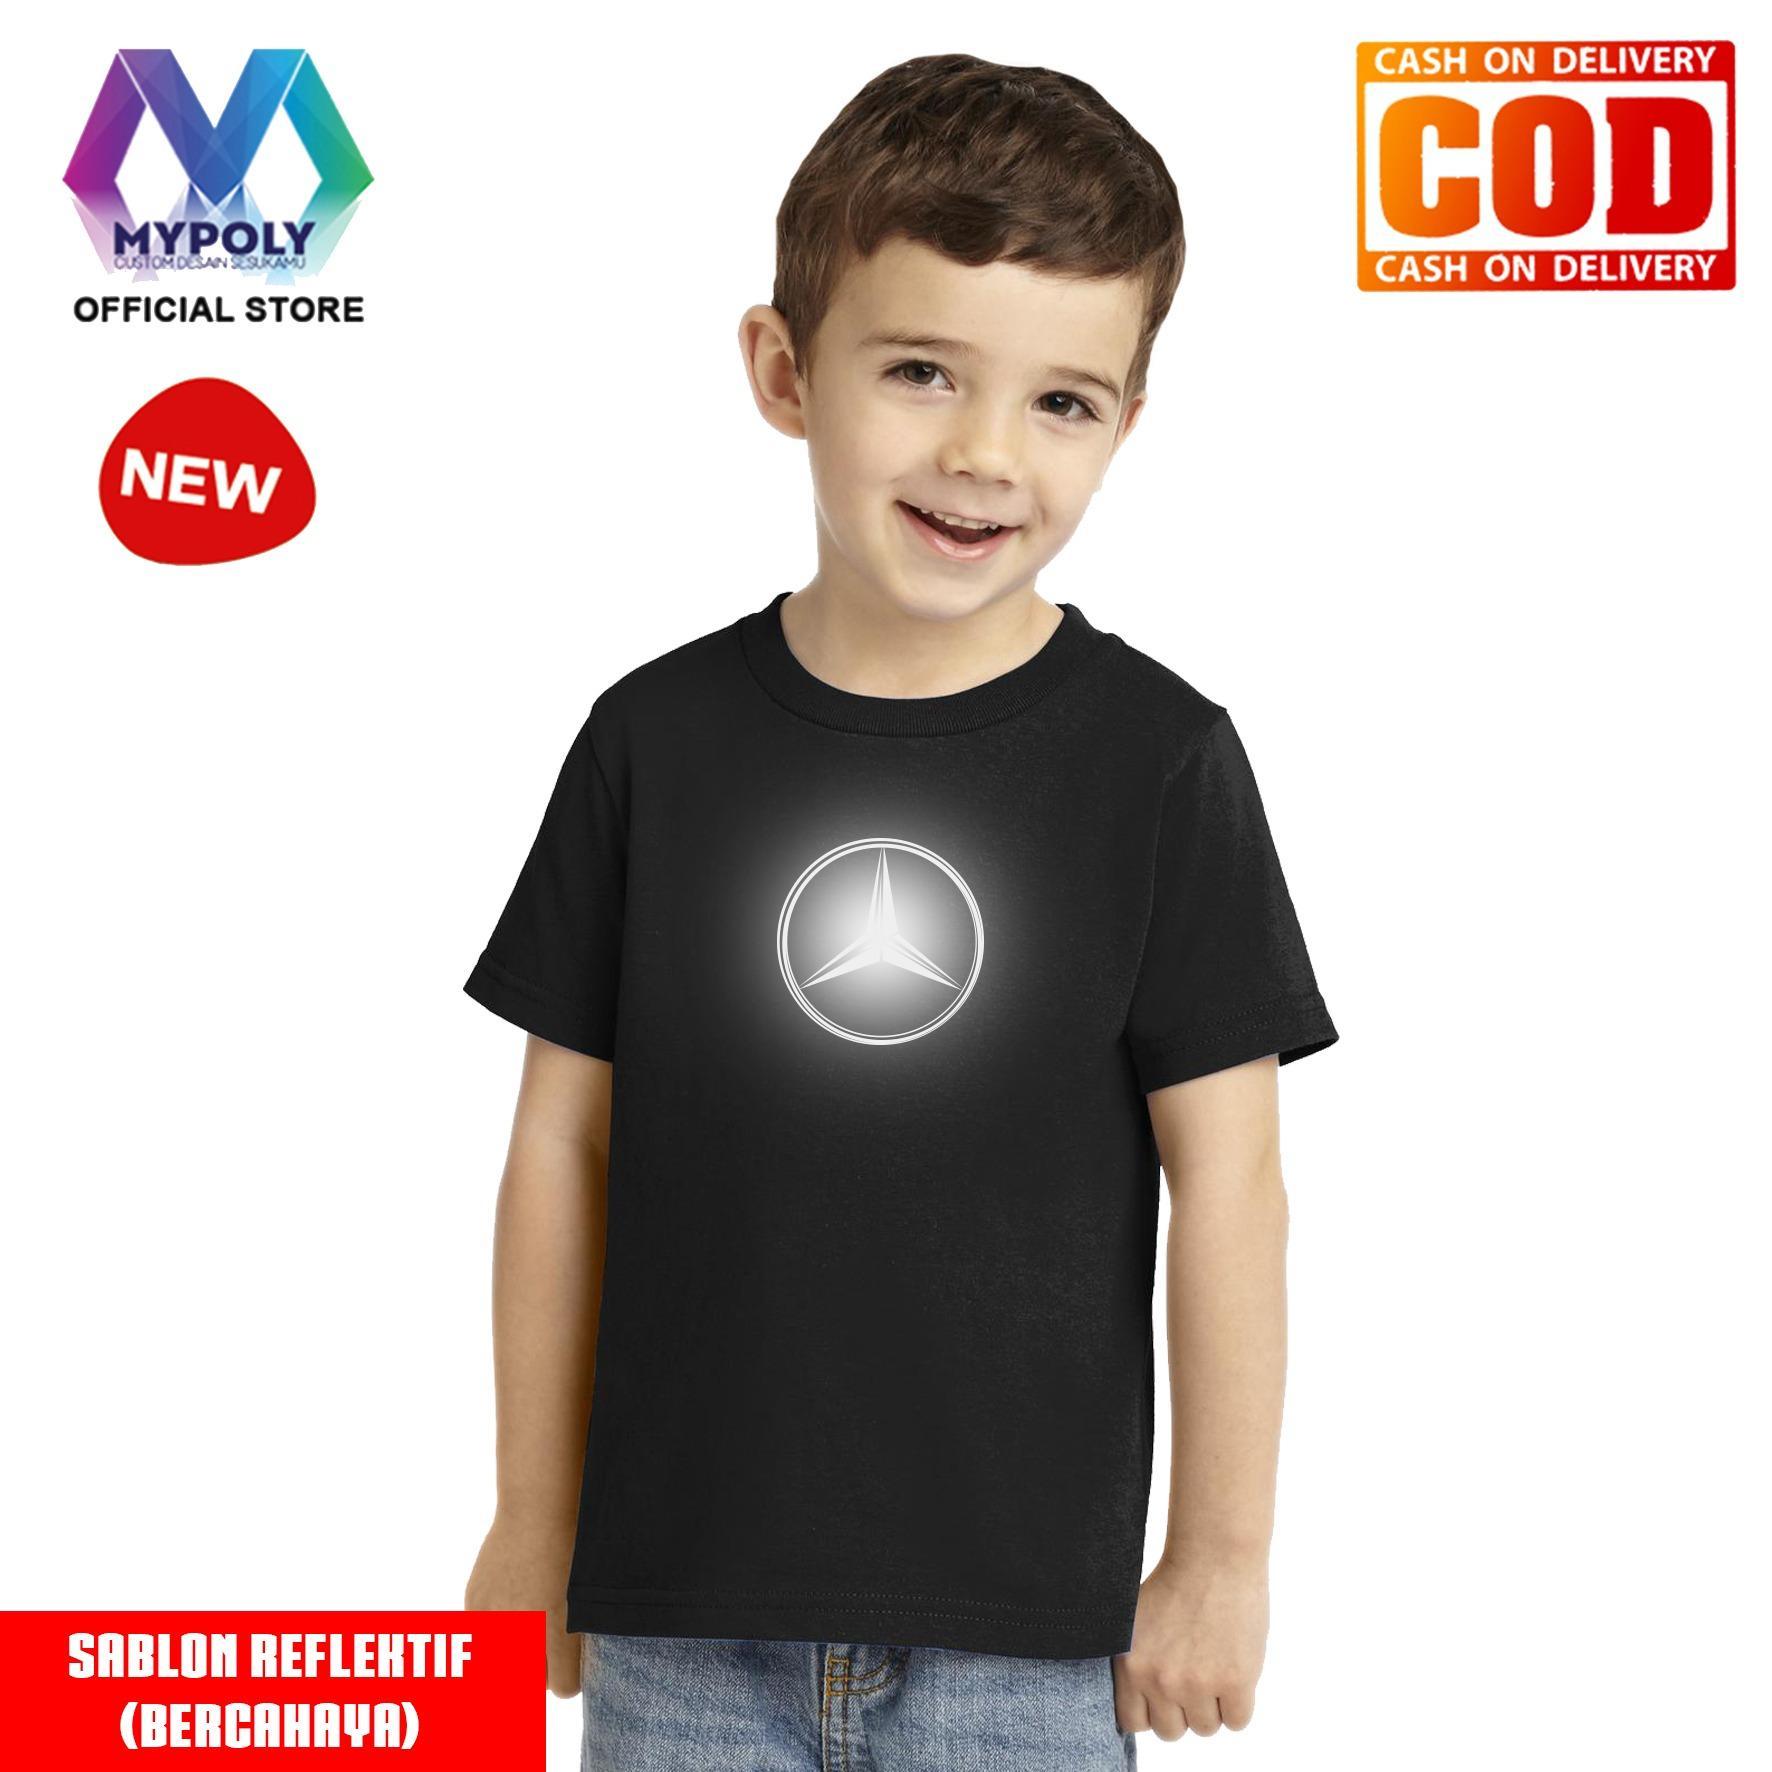 Kaos Premium Mypoly Anak Pria laki-laki AP / Baju Couple Family Keluarga / Tshirt distro / Fashion atasan / Kaos Anime / Kaos Animasi / Kaos Super Hero / Kaos Kartun / Kaos Cartoon / Kaos Lucu / Kaos Gambar Karakter / Kaos Anak Marcedes B